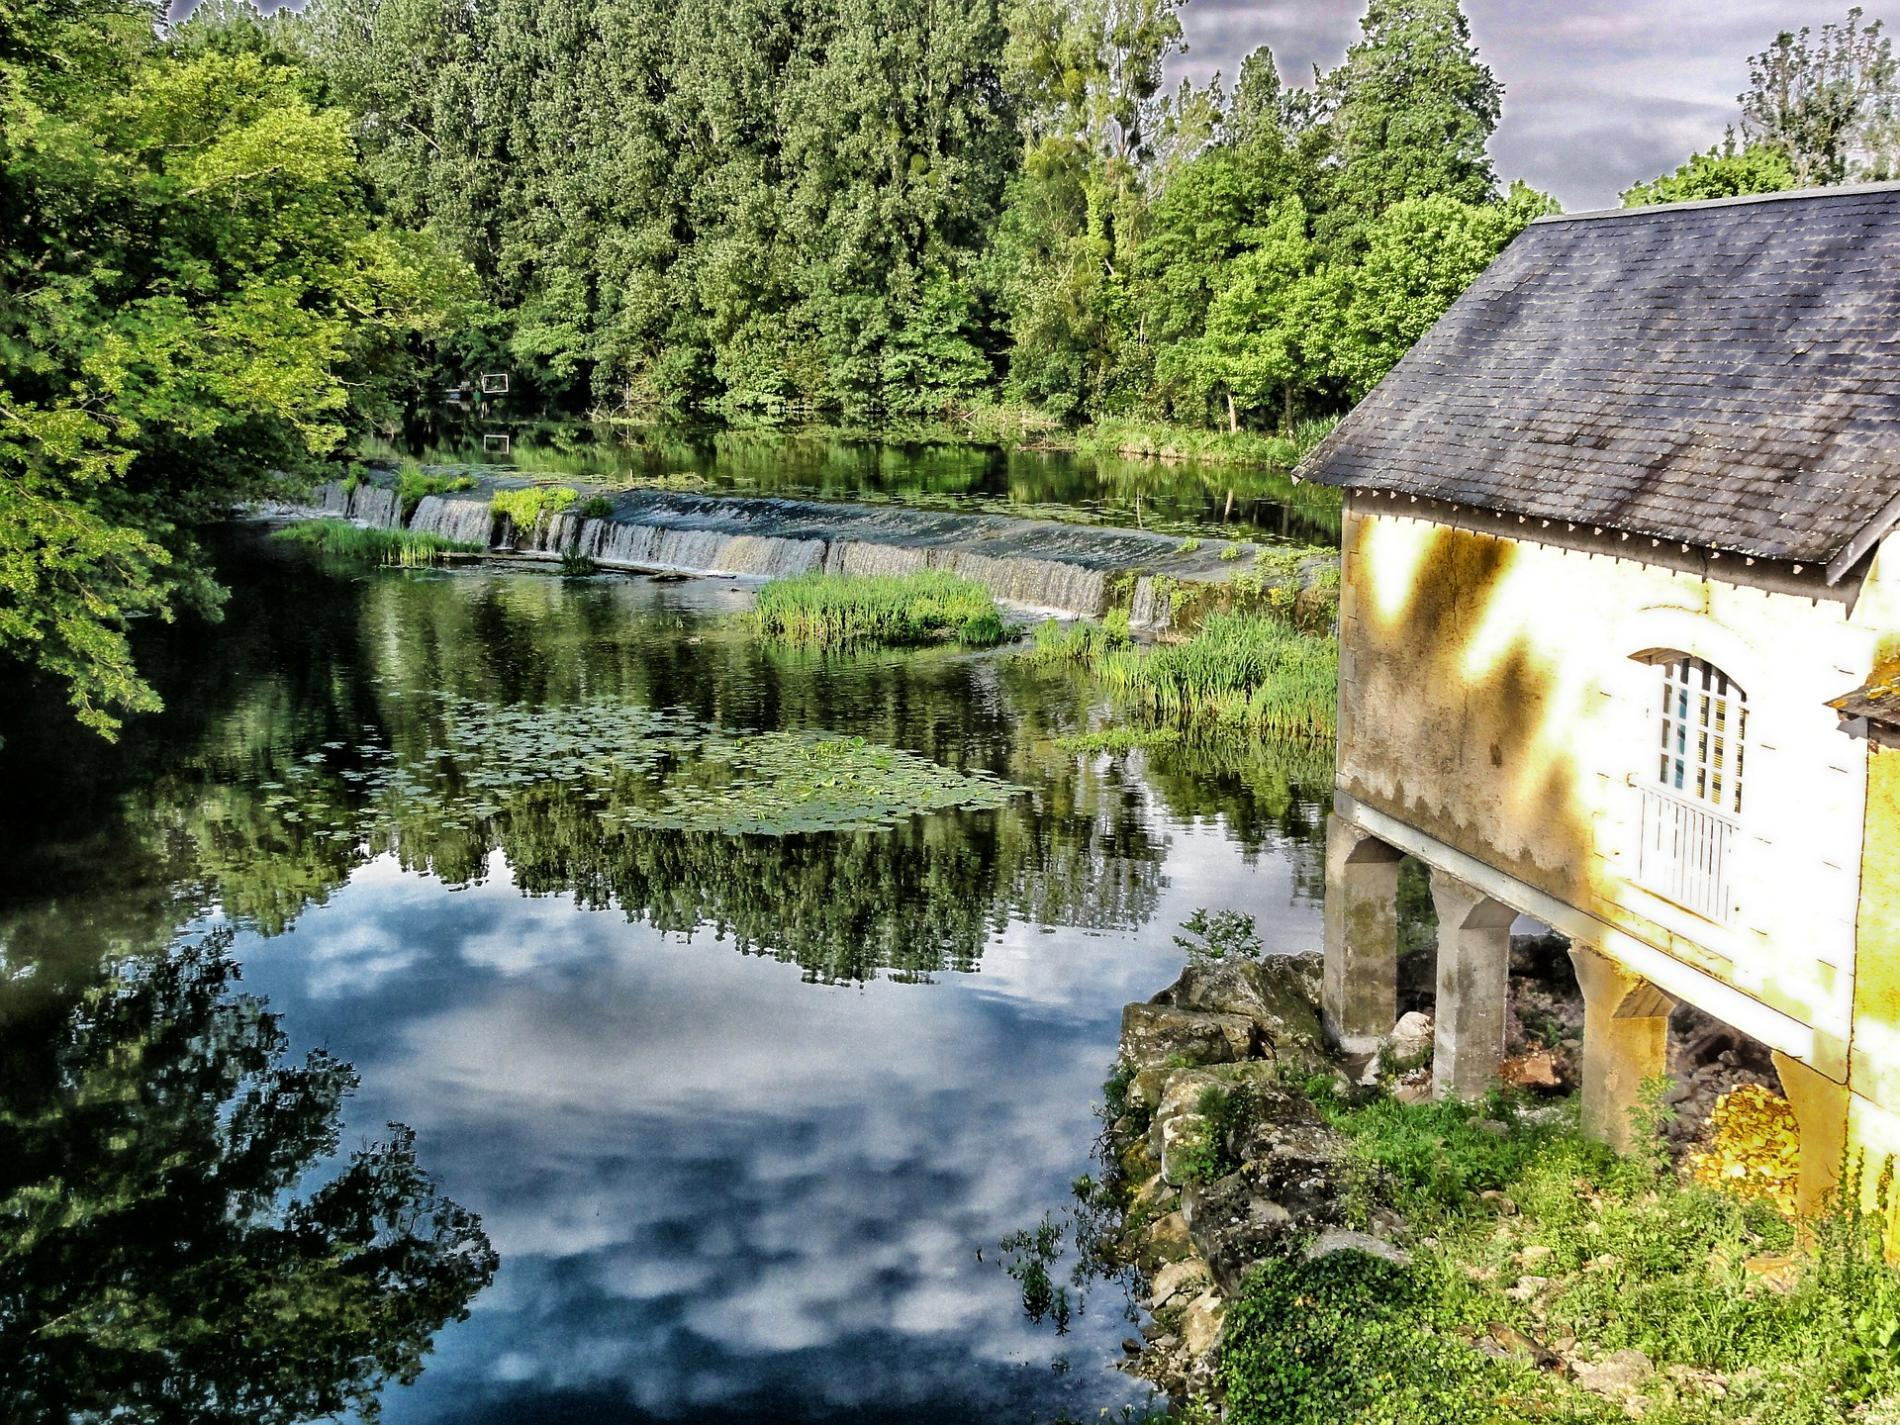 Marais Poitevin Regional Nature Park